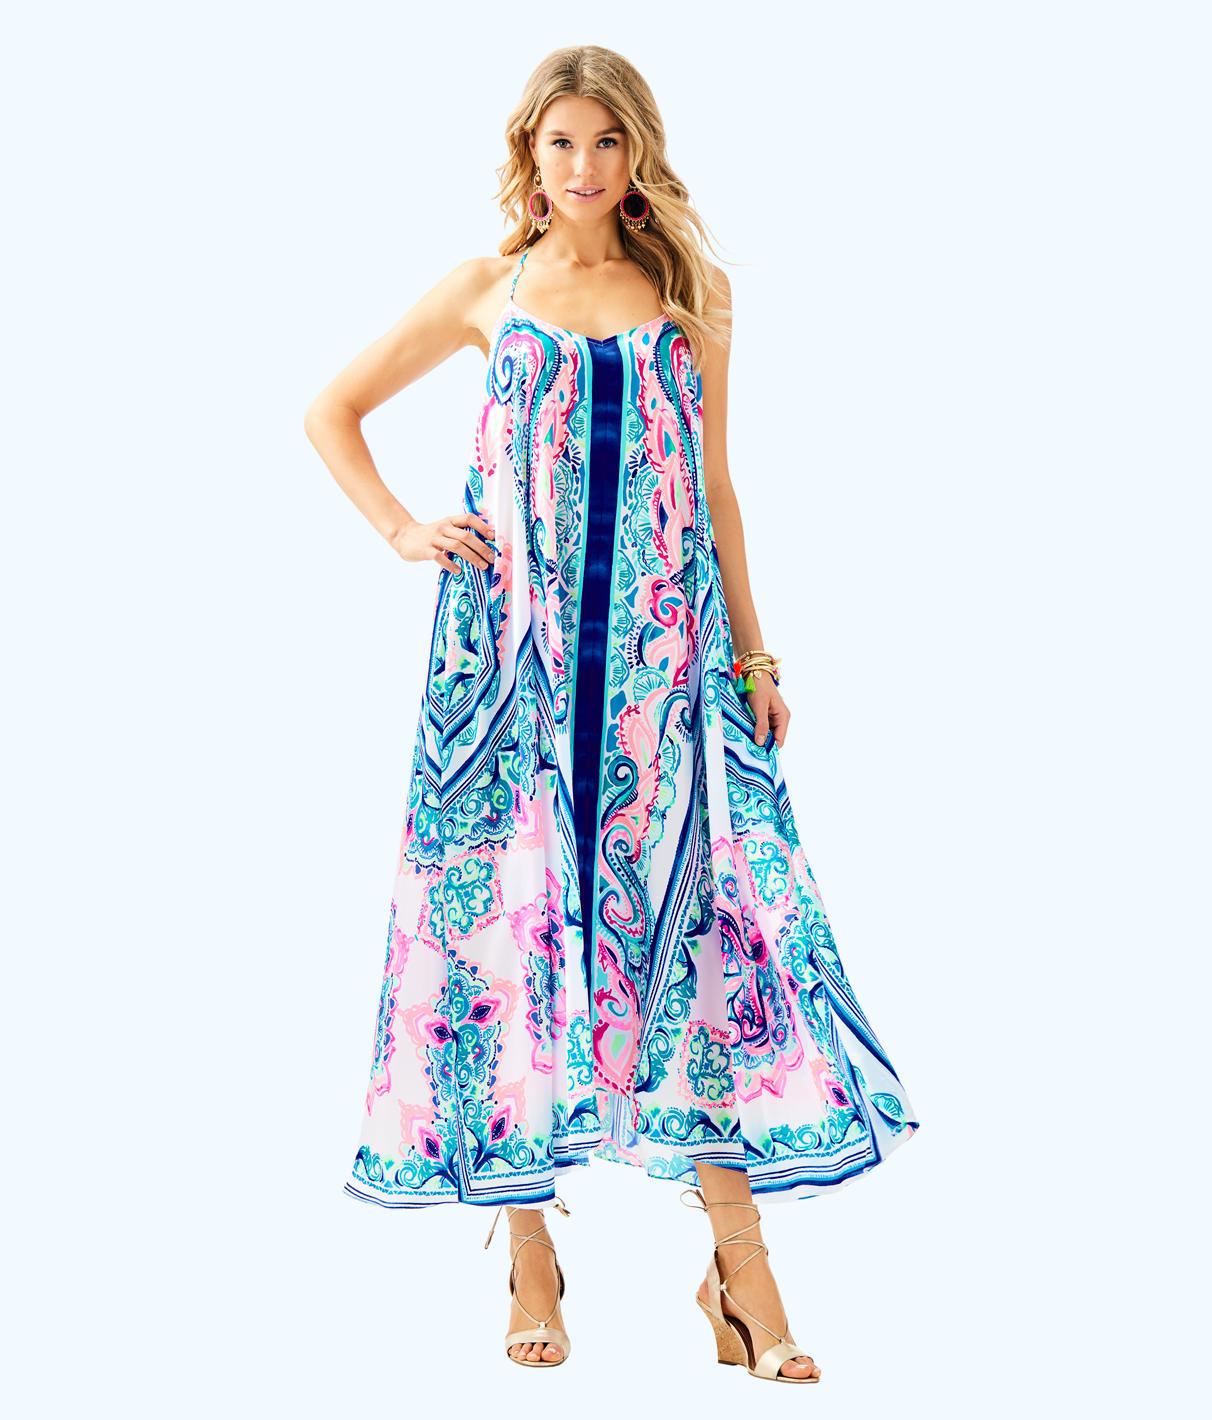 Lilly Pulitzer Lilly Pulitzer Womens Juna Maxi Dress